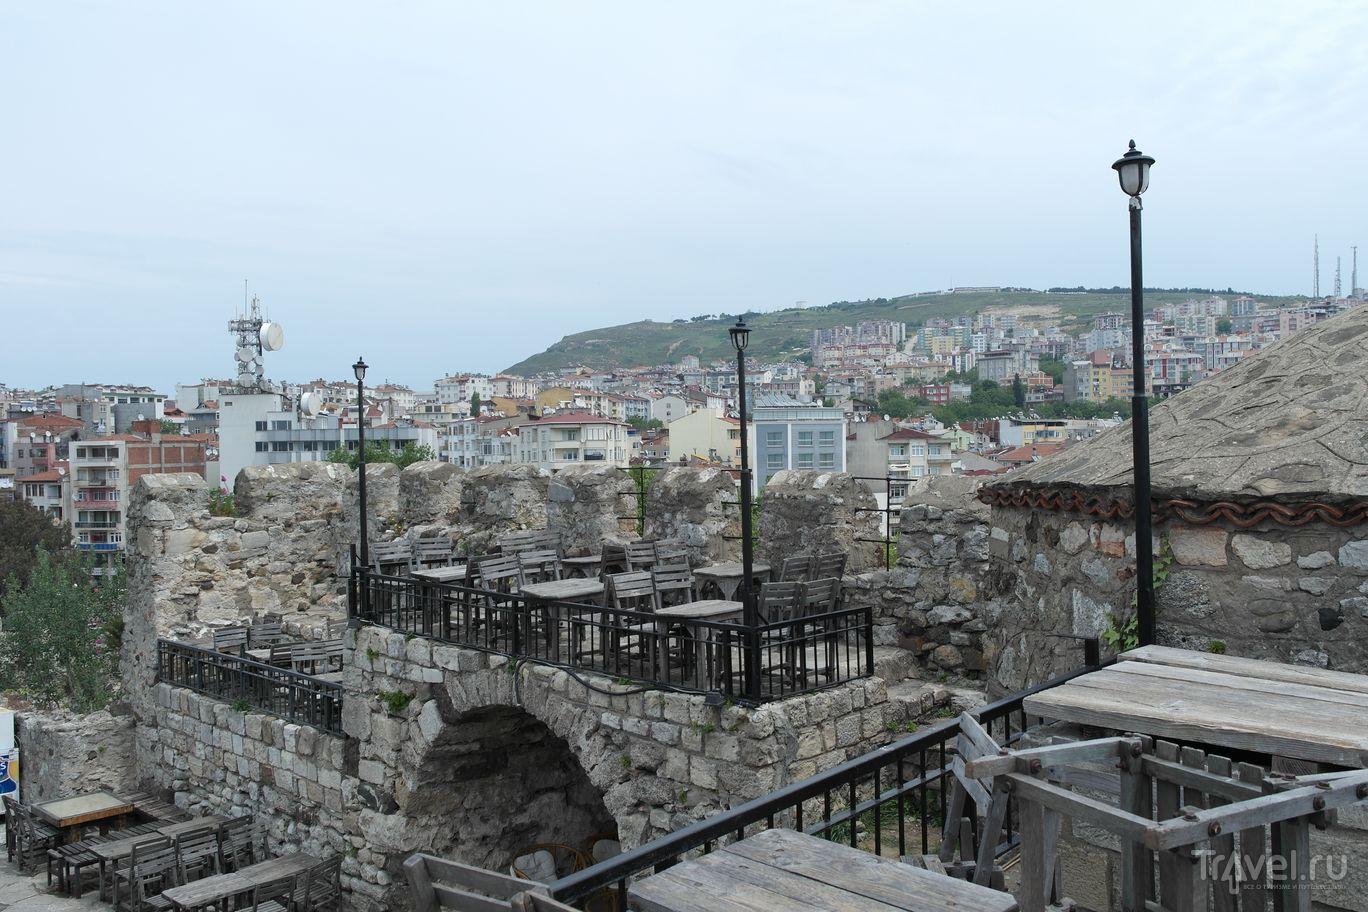 Синоп (турецкое причерноморье) / Турция